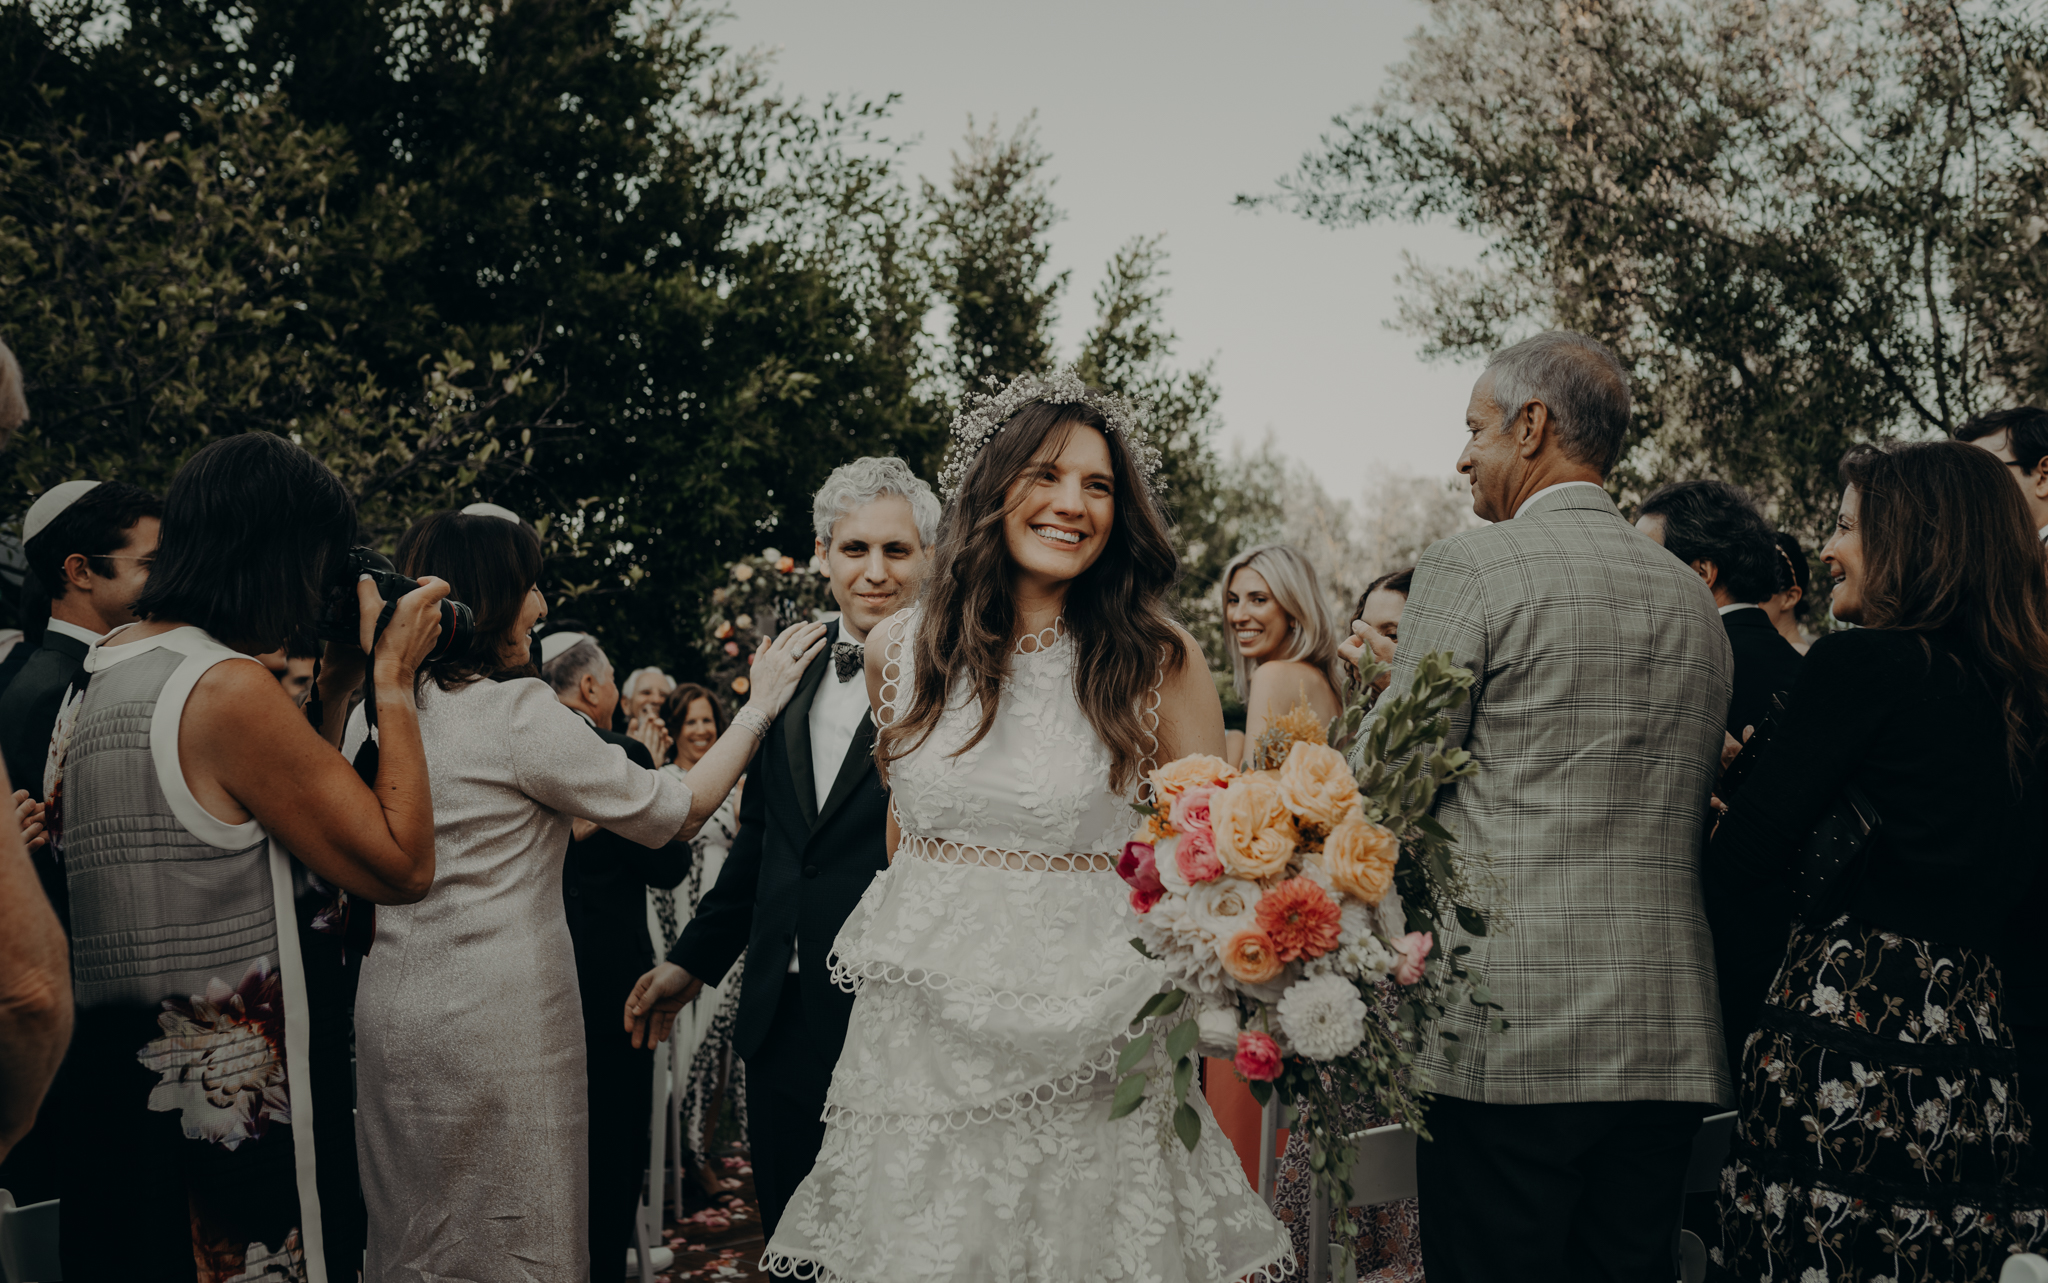 Isaiah + Taylor Photography - Private Estate Backyard Wedding - Beverly Hills - Los Angeles Wedding Photographer - 83.jpg